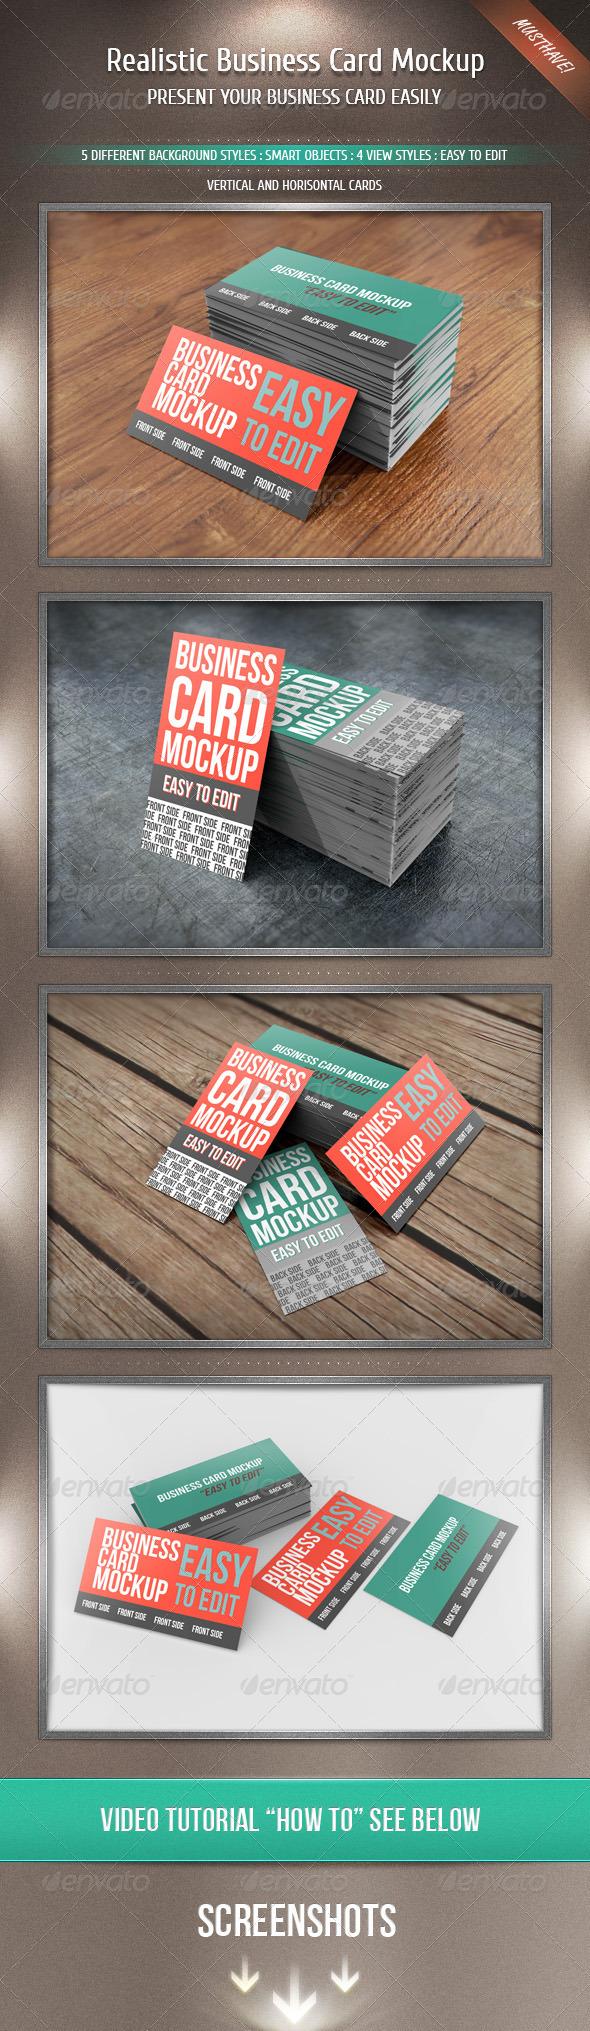 GraphicRiver Realistic Business Card Mockup 2506978